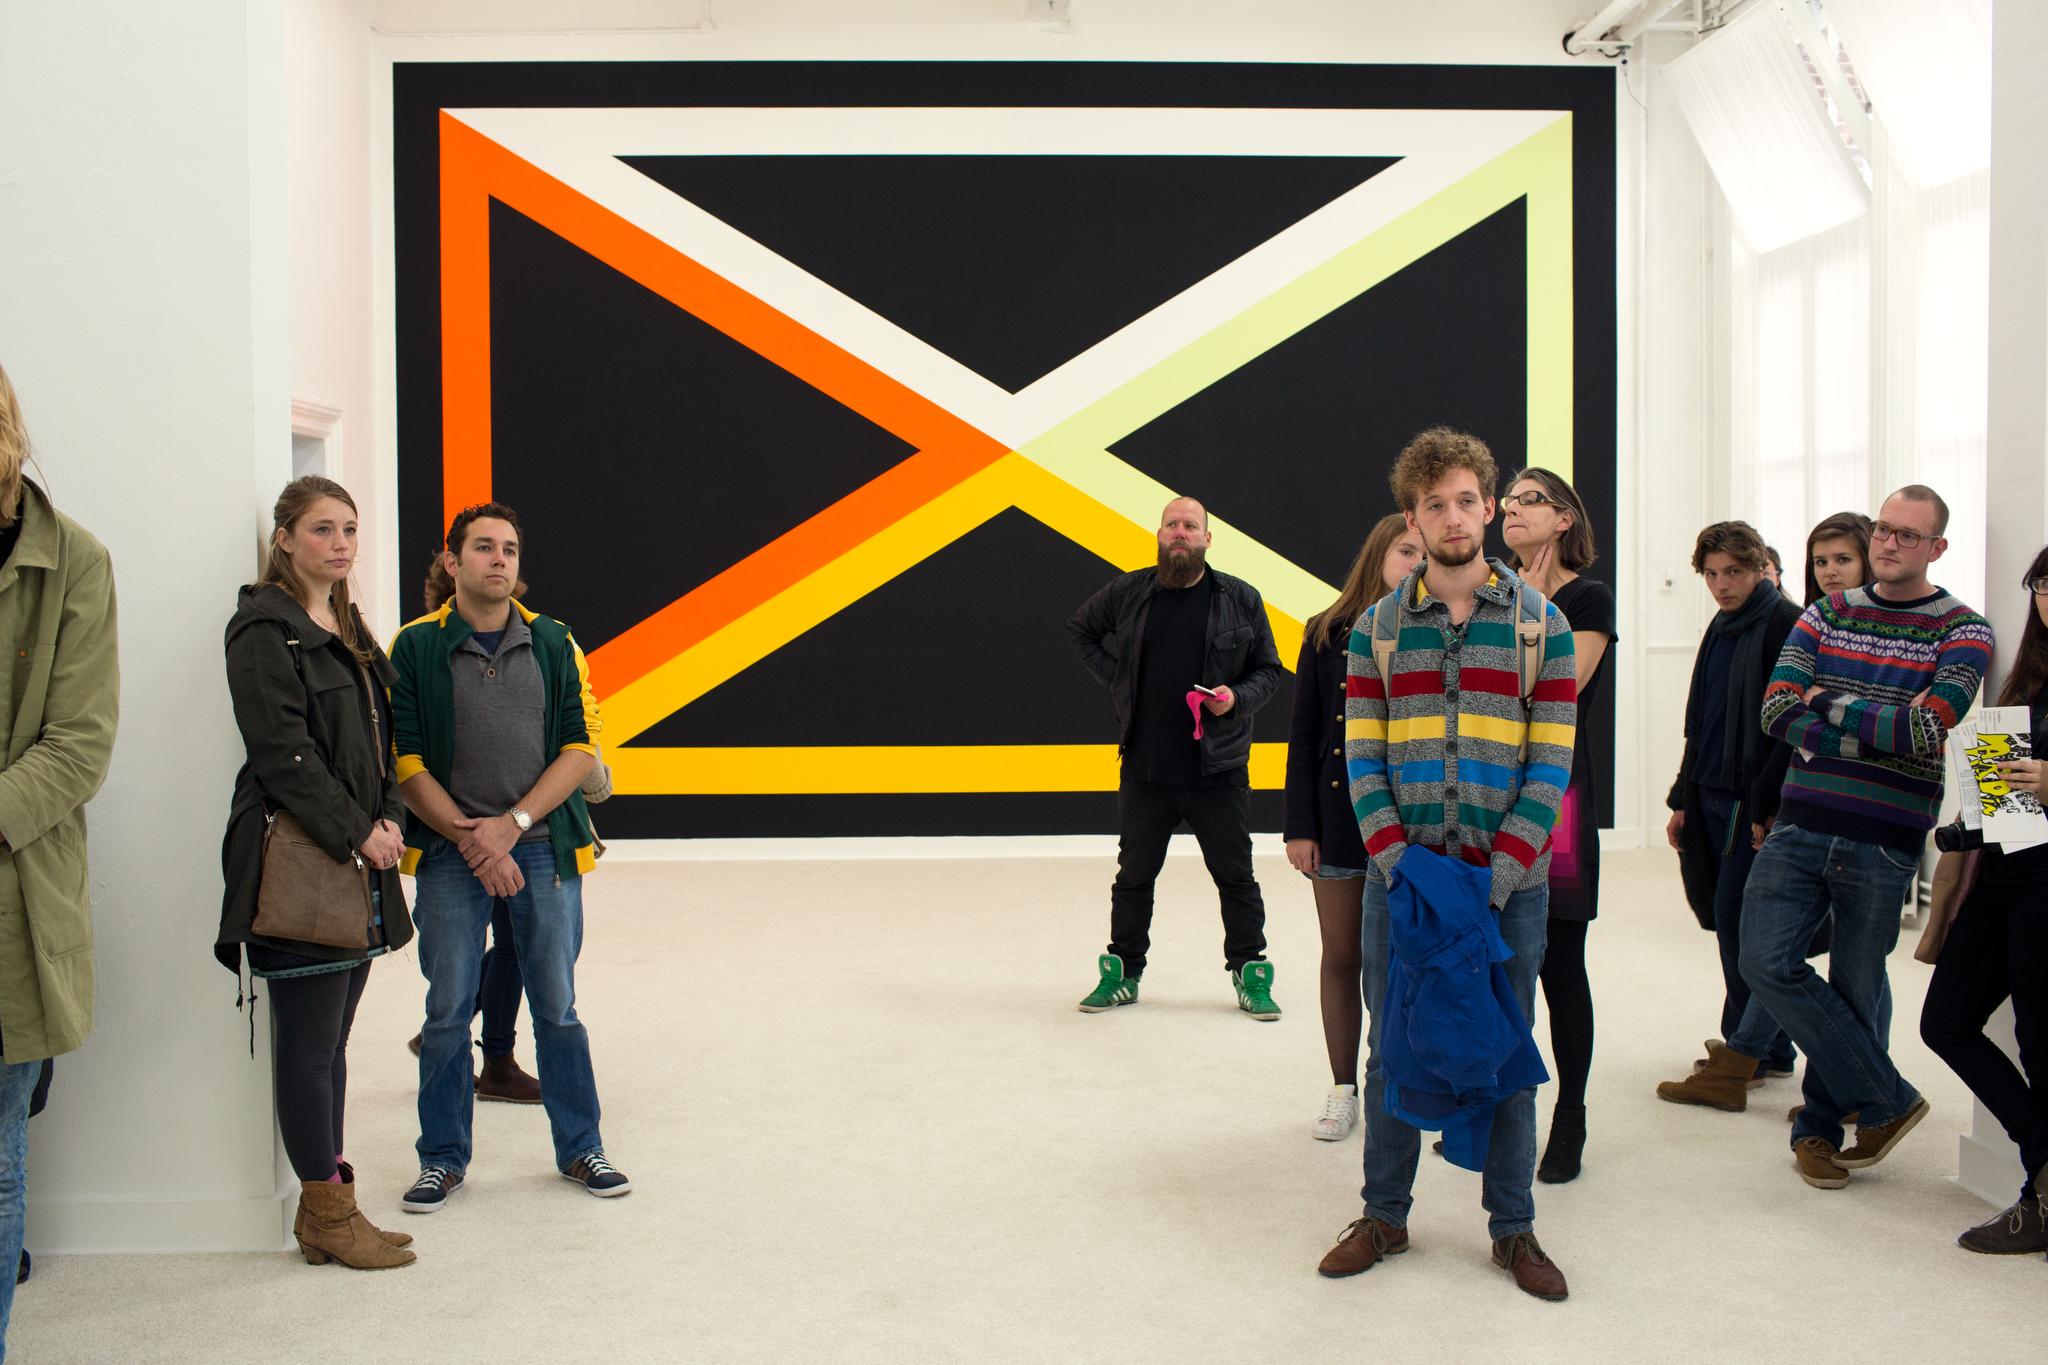 Photo: Dirk-Jan Visser / Groningen- Nederland / 03-10-2015: Opening van tentoonstelling van Jan van der Ploeg kamer in galerie NP3